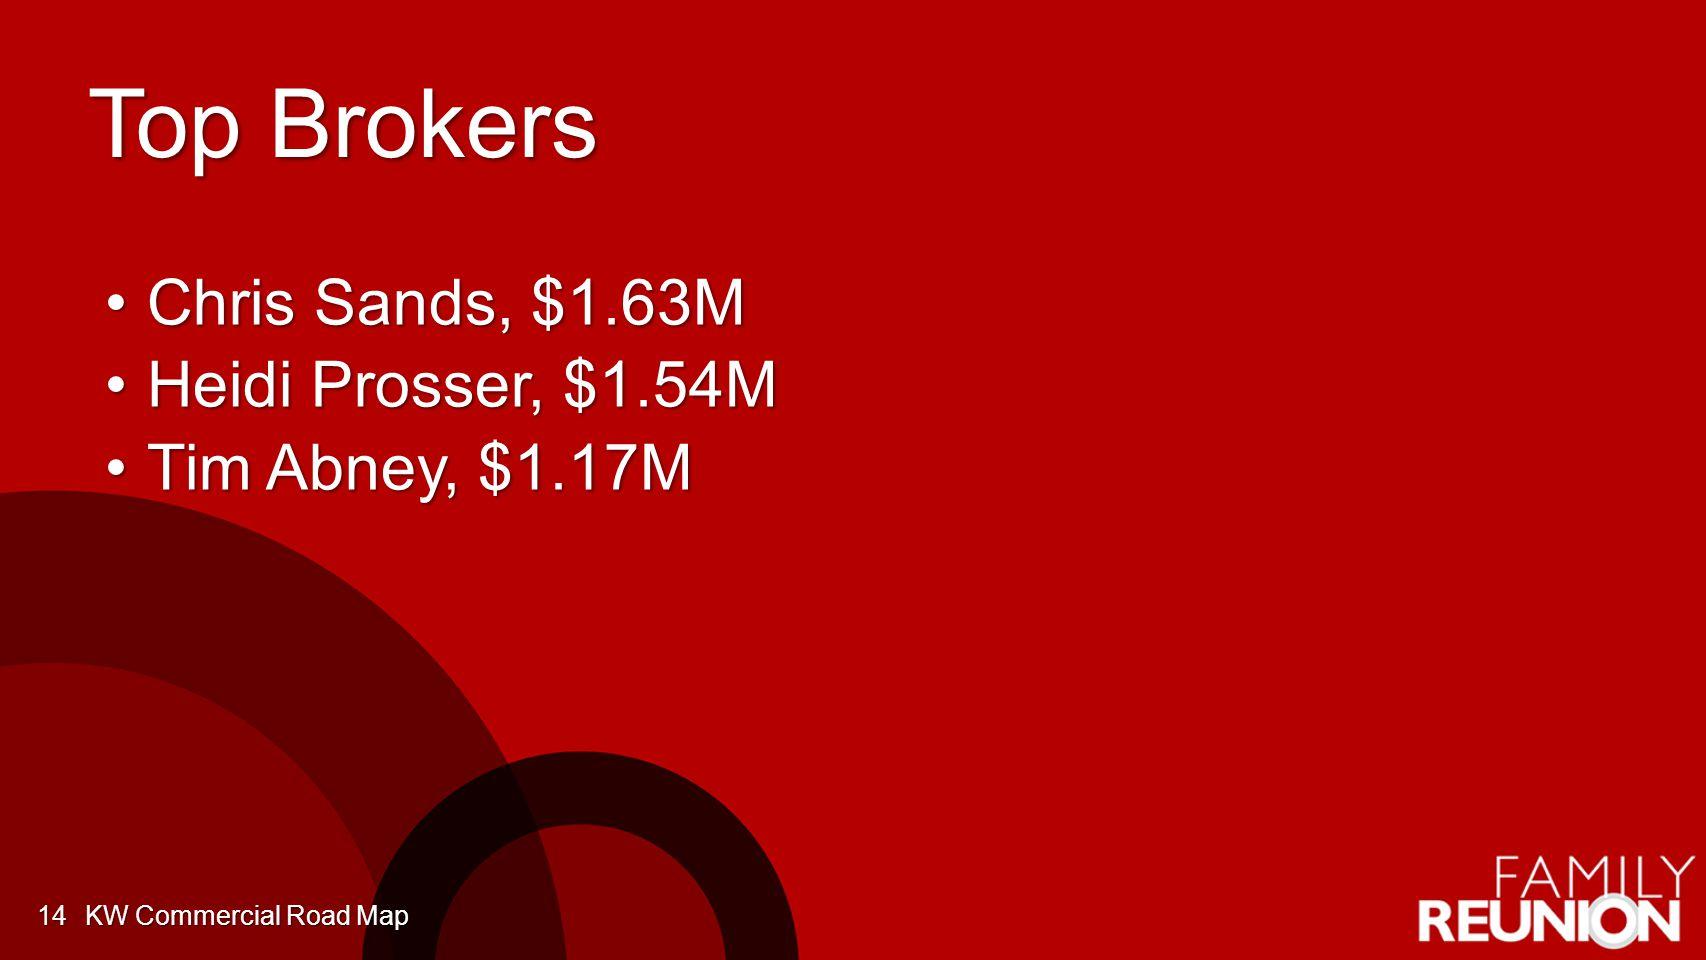 Top Brokers Chris Sands, $1.63MChris Sands, $1.63M Heidi Prosser, $1.54MHeidi Prosser, $1.54M Tim Abney, $1.17MTim Abney, $1.17M KW Commercial Road Map14